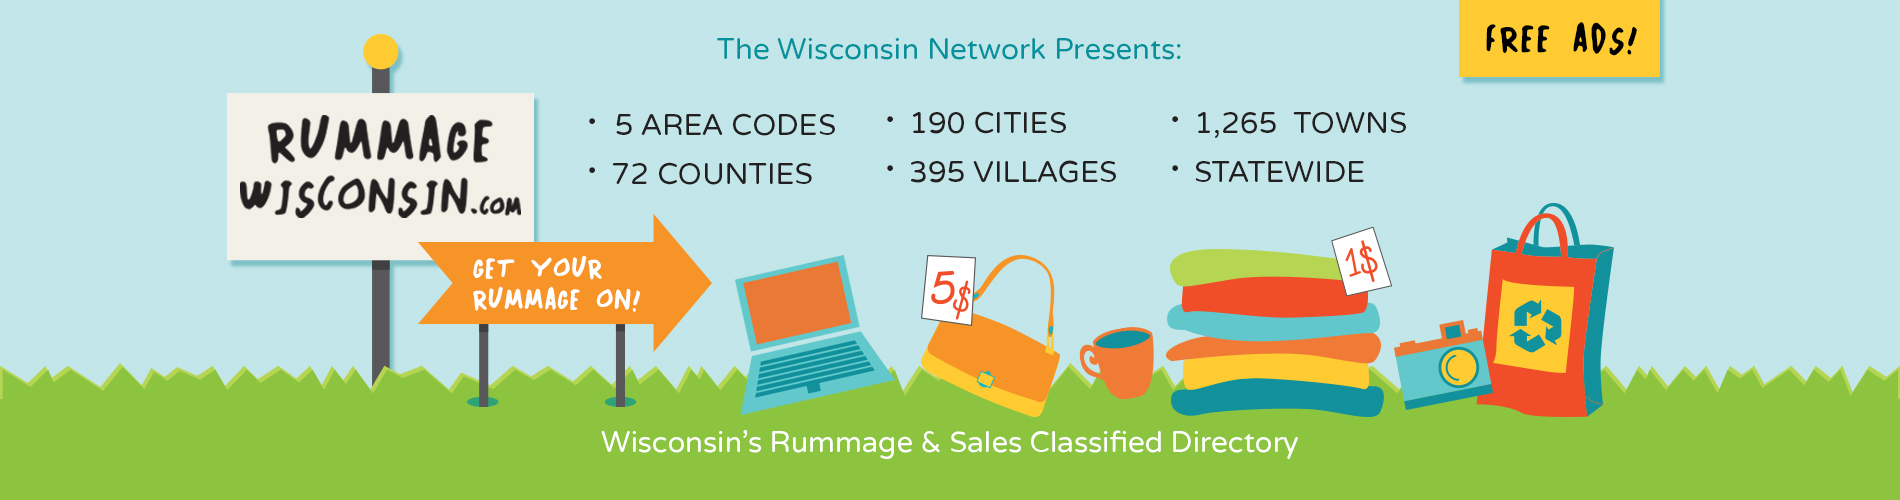 Rummage Wisconsin.com, Free Rummage Sale Classified Ads, Rummage ...